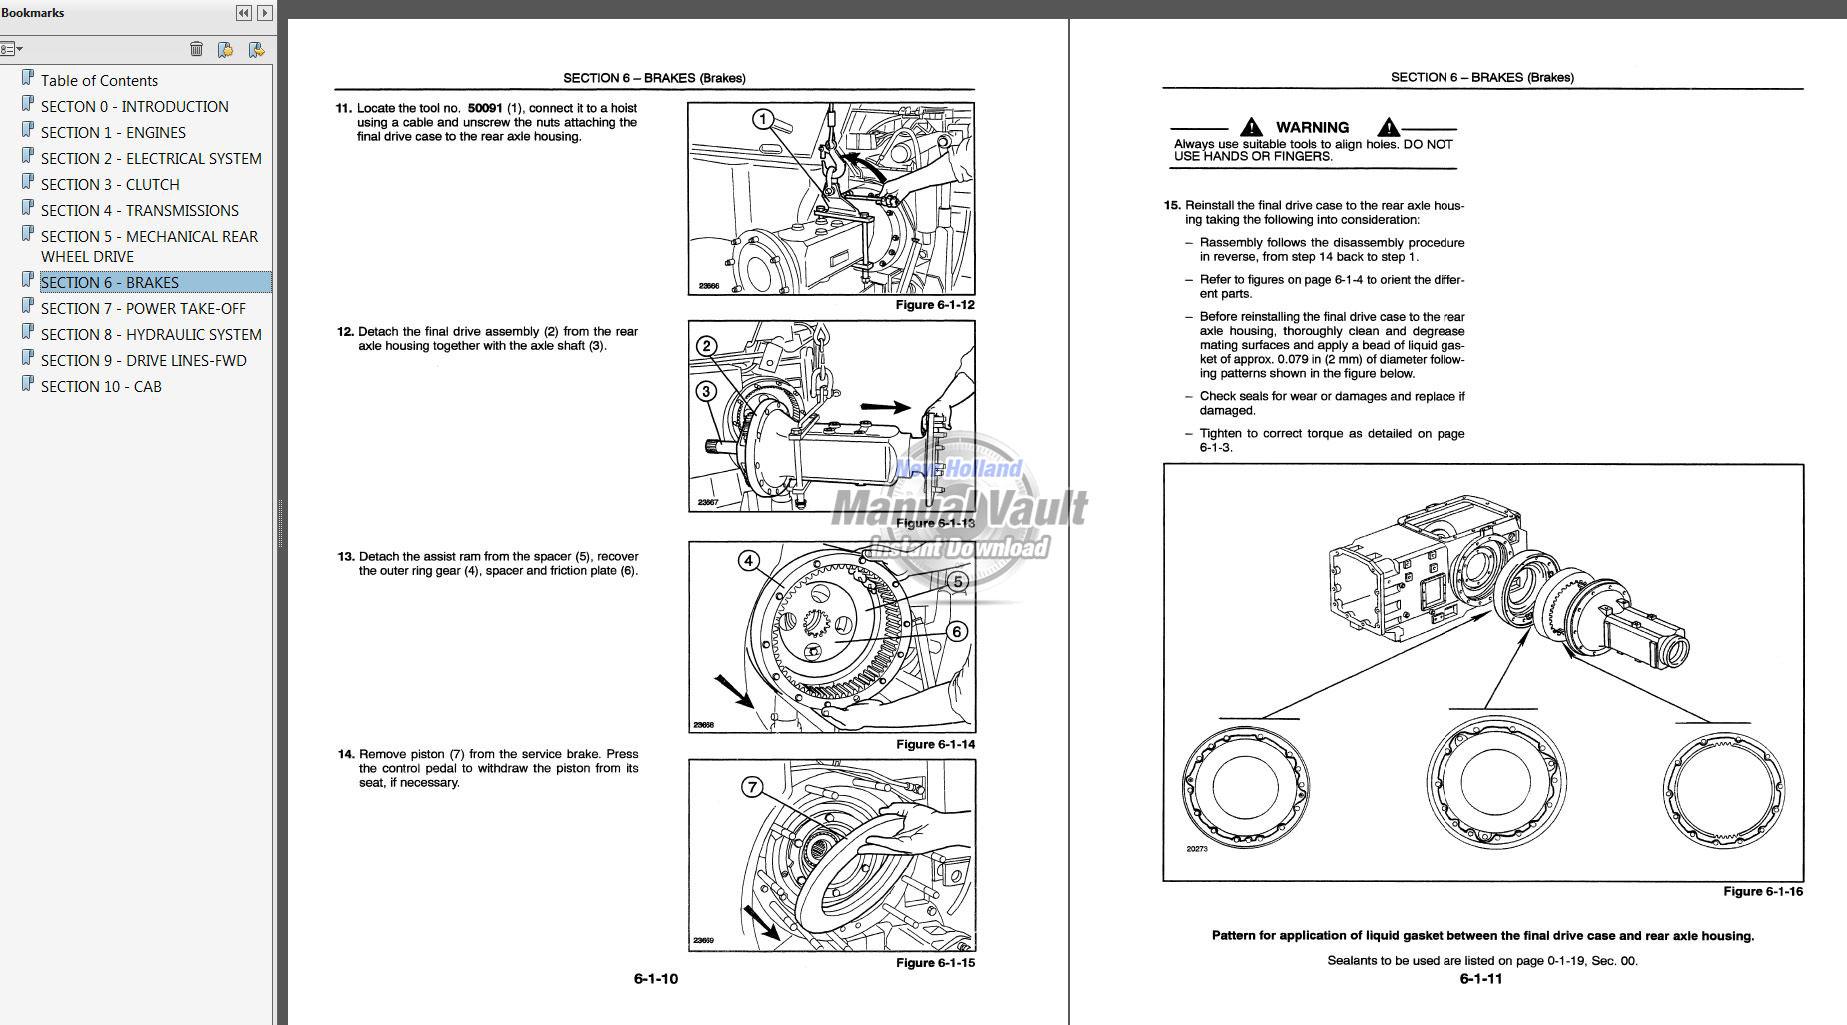 Service Manual vault New holland Ls170 skid steer on